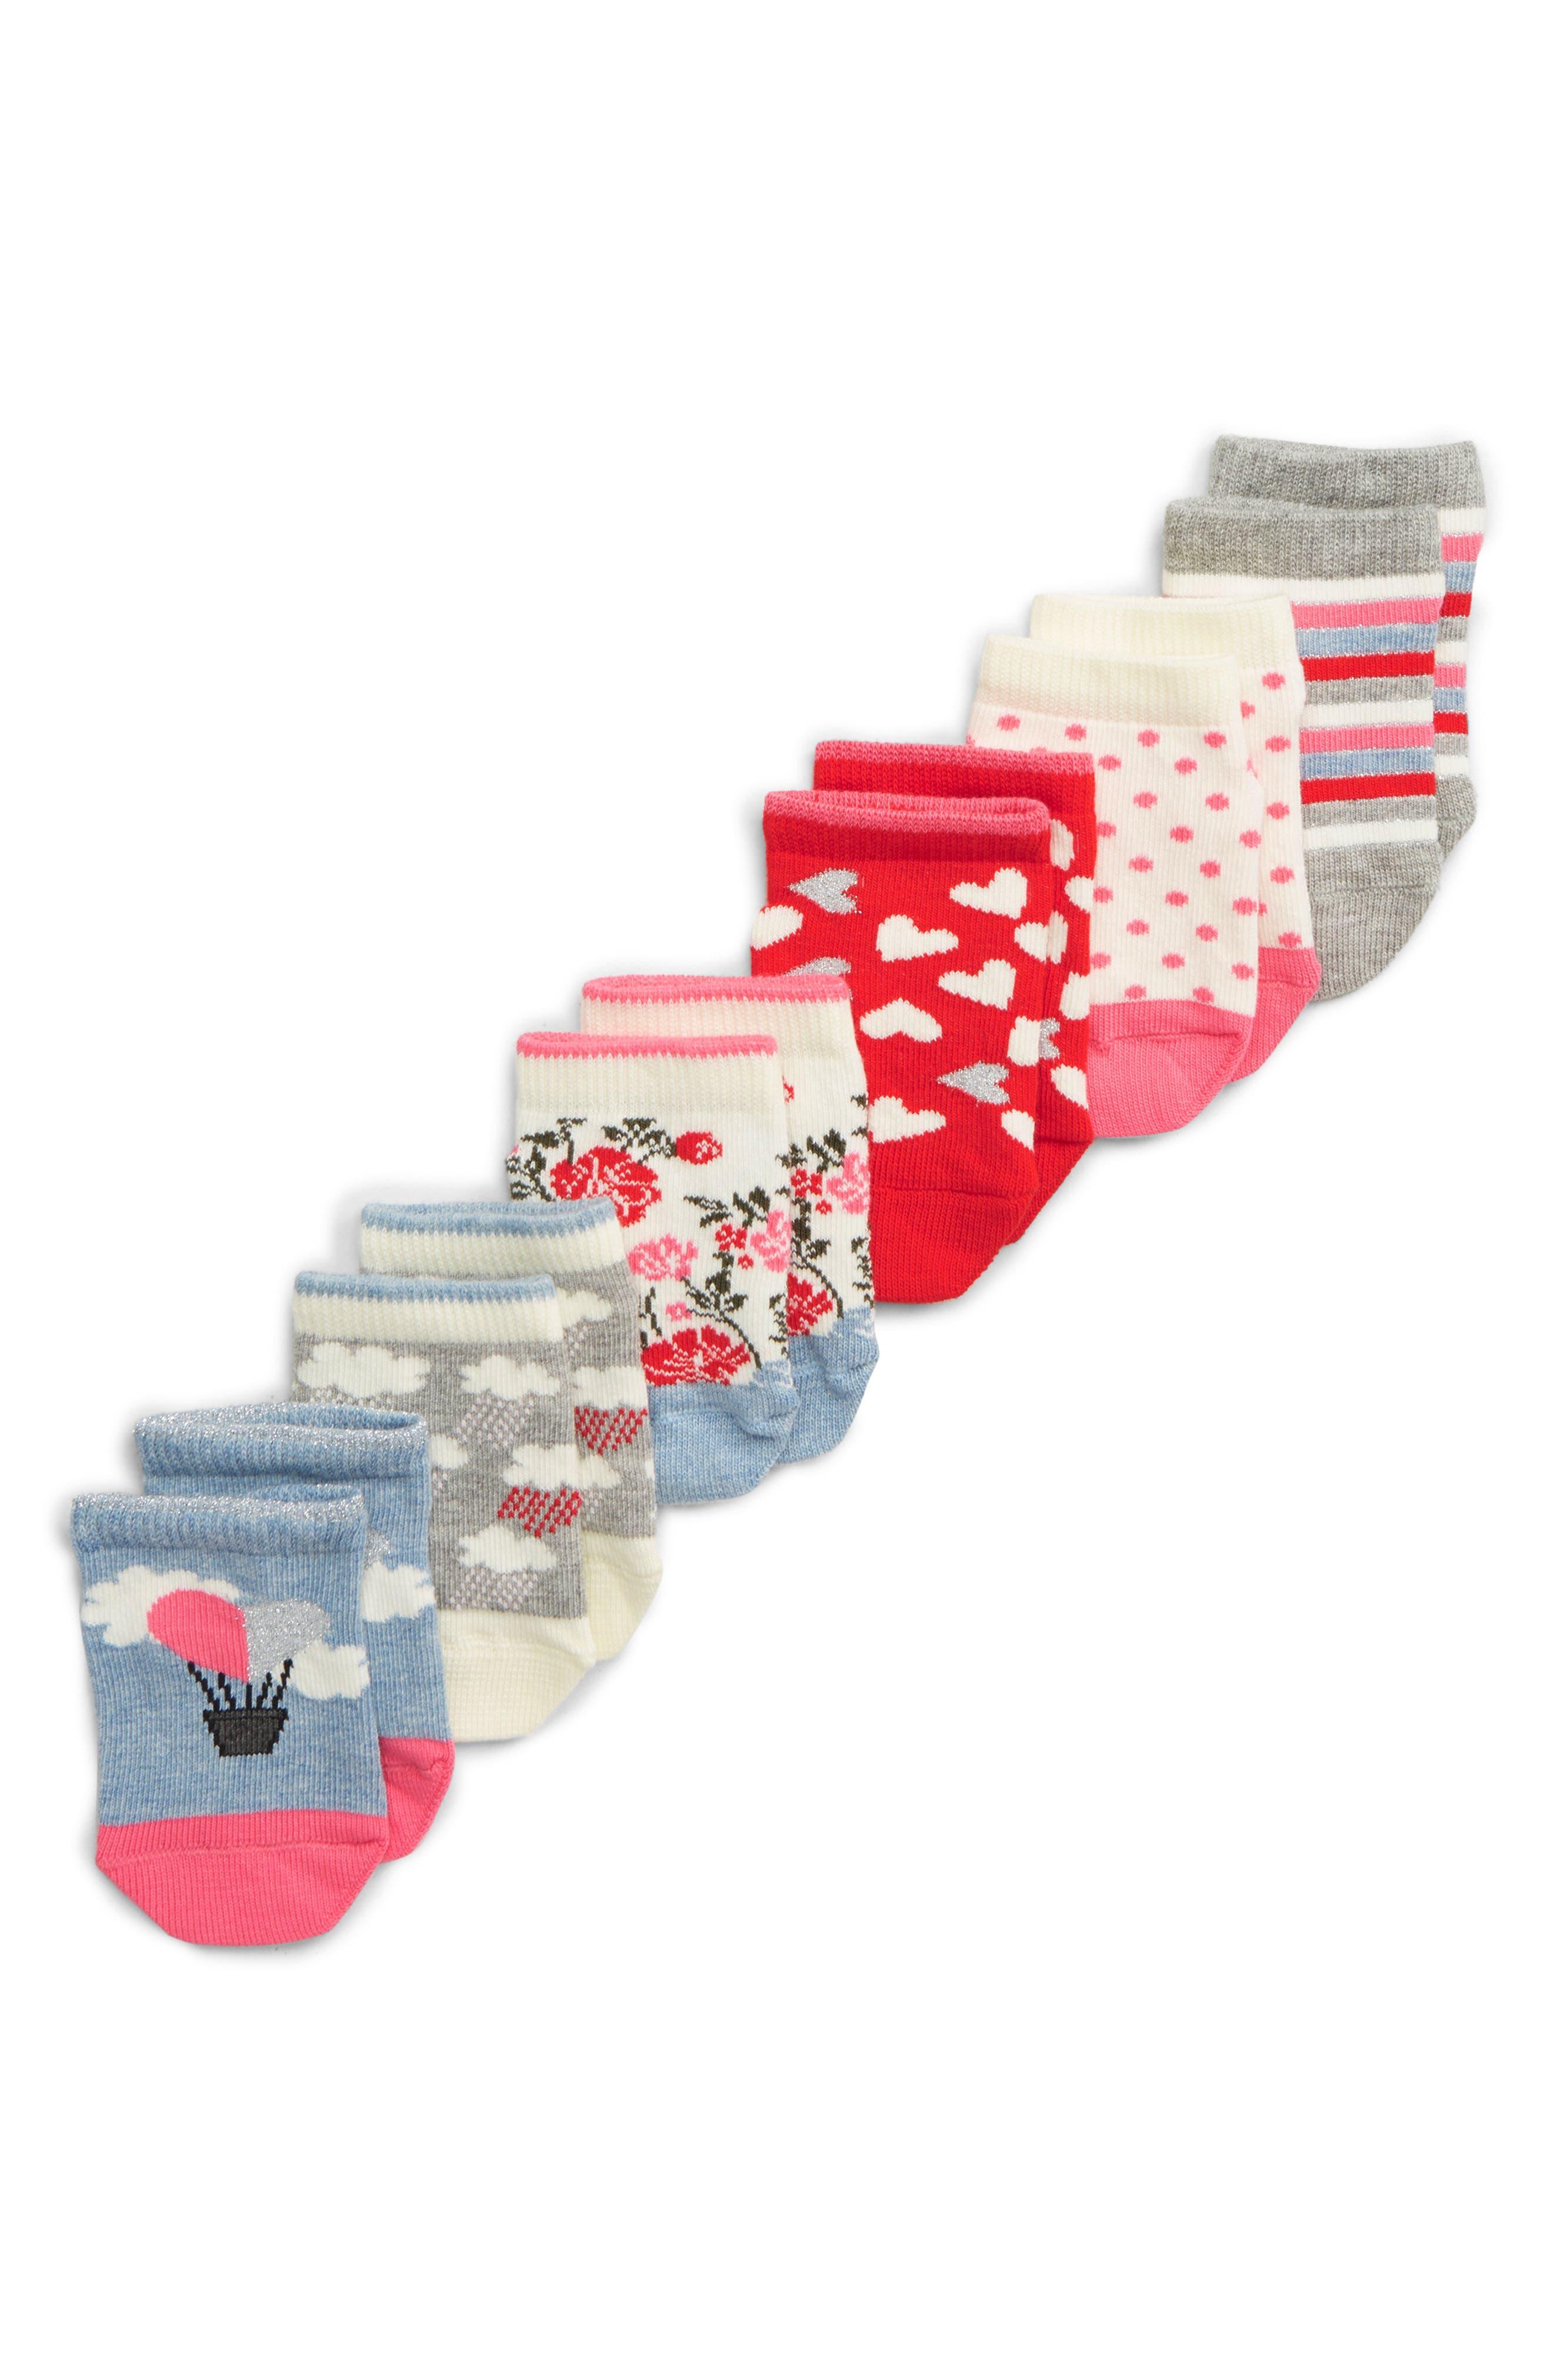 Girls Tucker  Tate 6Pack Low Cut Socks Size 410  White